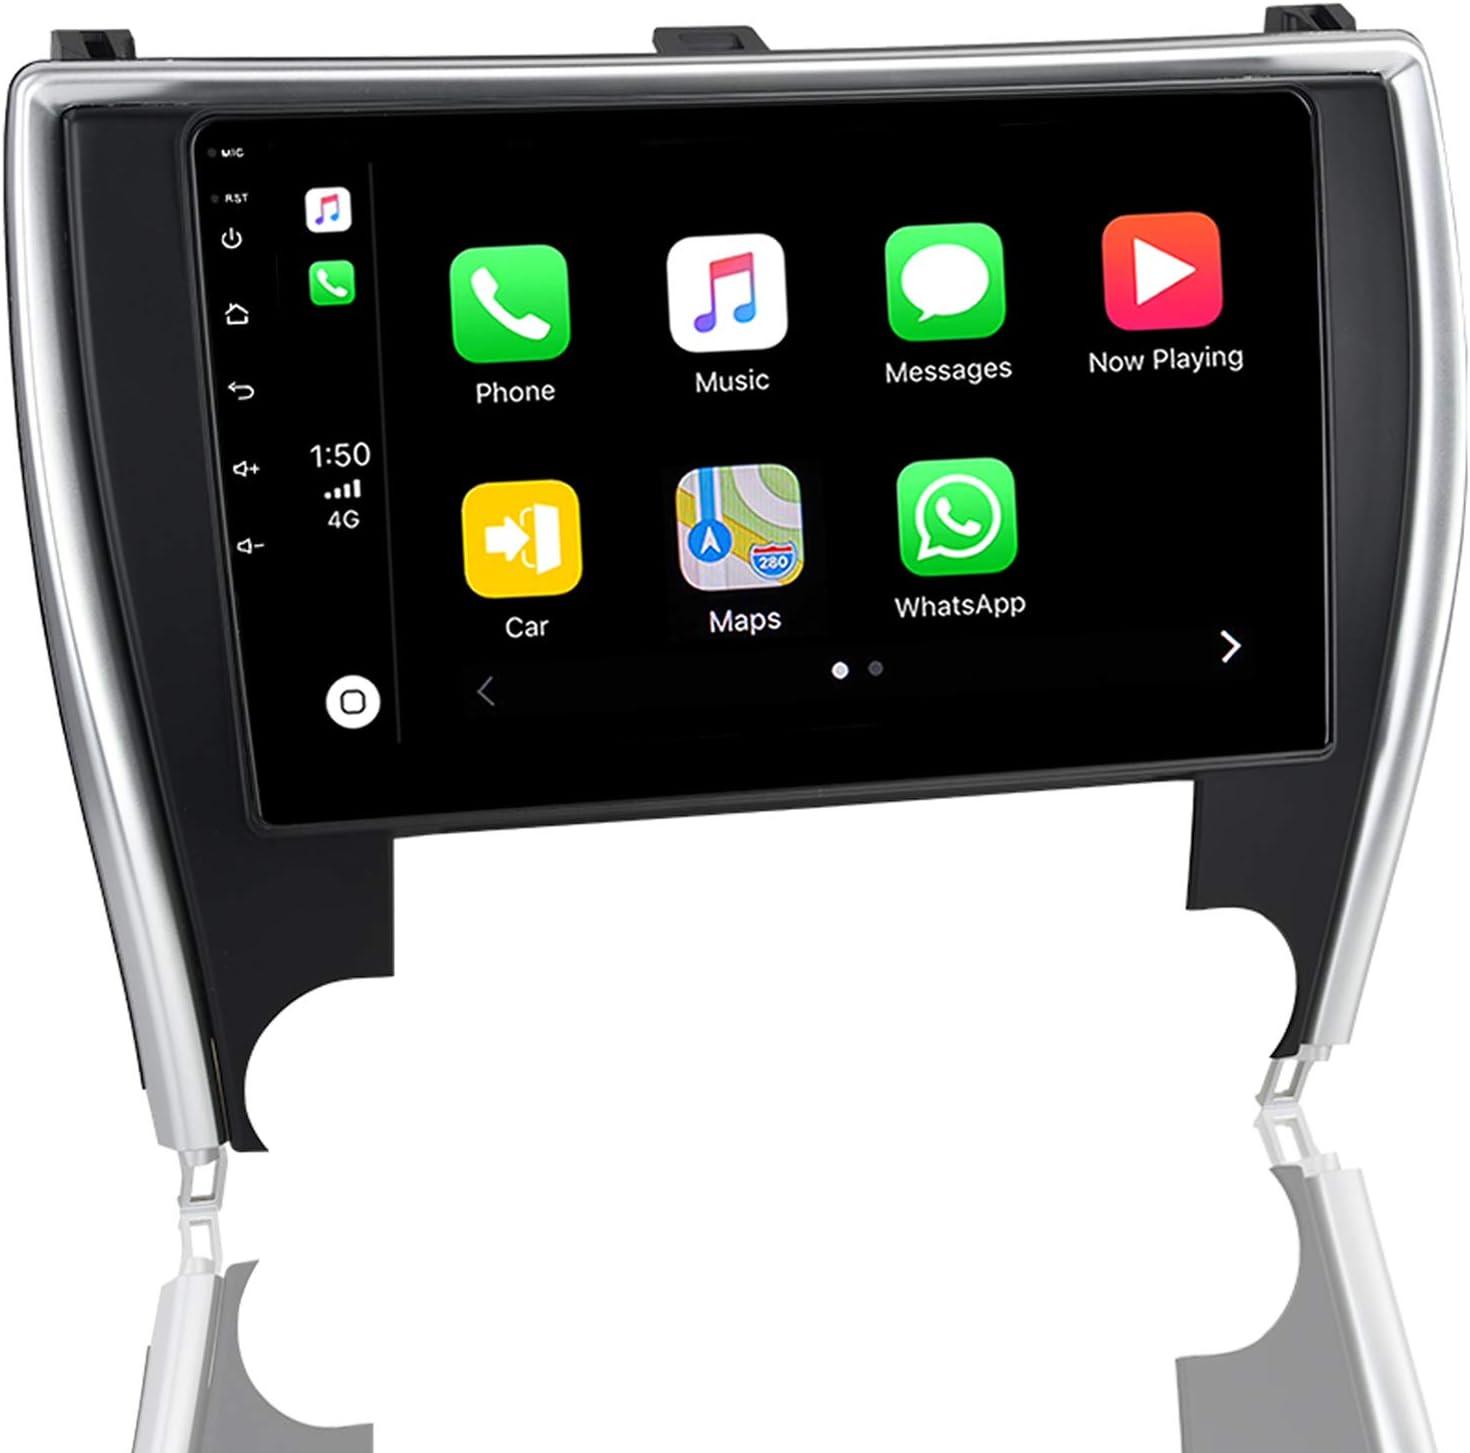 ViaBecs Android 10.0 Car Stereo with Bluetooth 5.0 Wireless Carplay for Toyota Camry 2015-2017 Single Din Head Unit Car Audio 1280 x 720 Google Maps Split Screen USB RDS Radio SWC 4GB/64GB